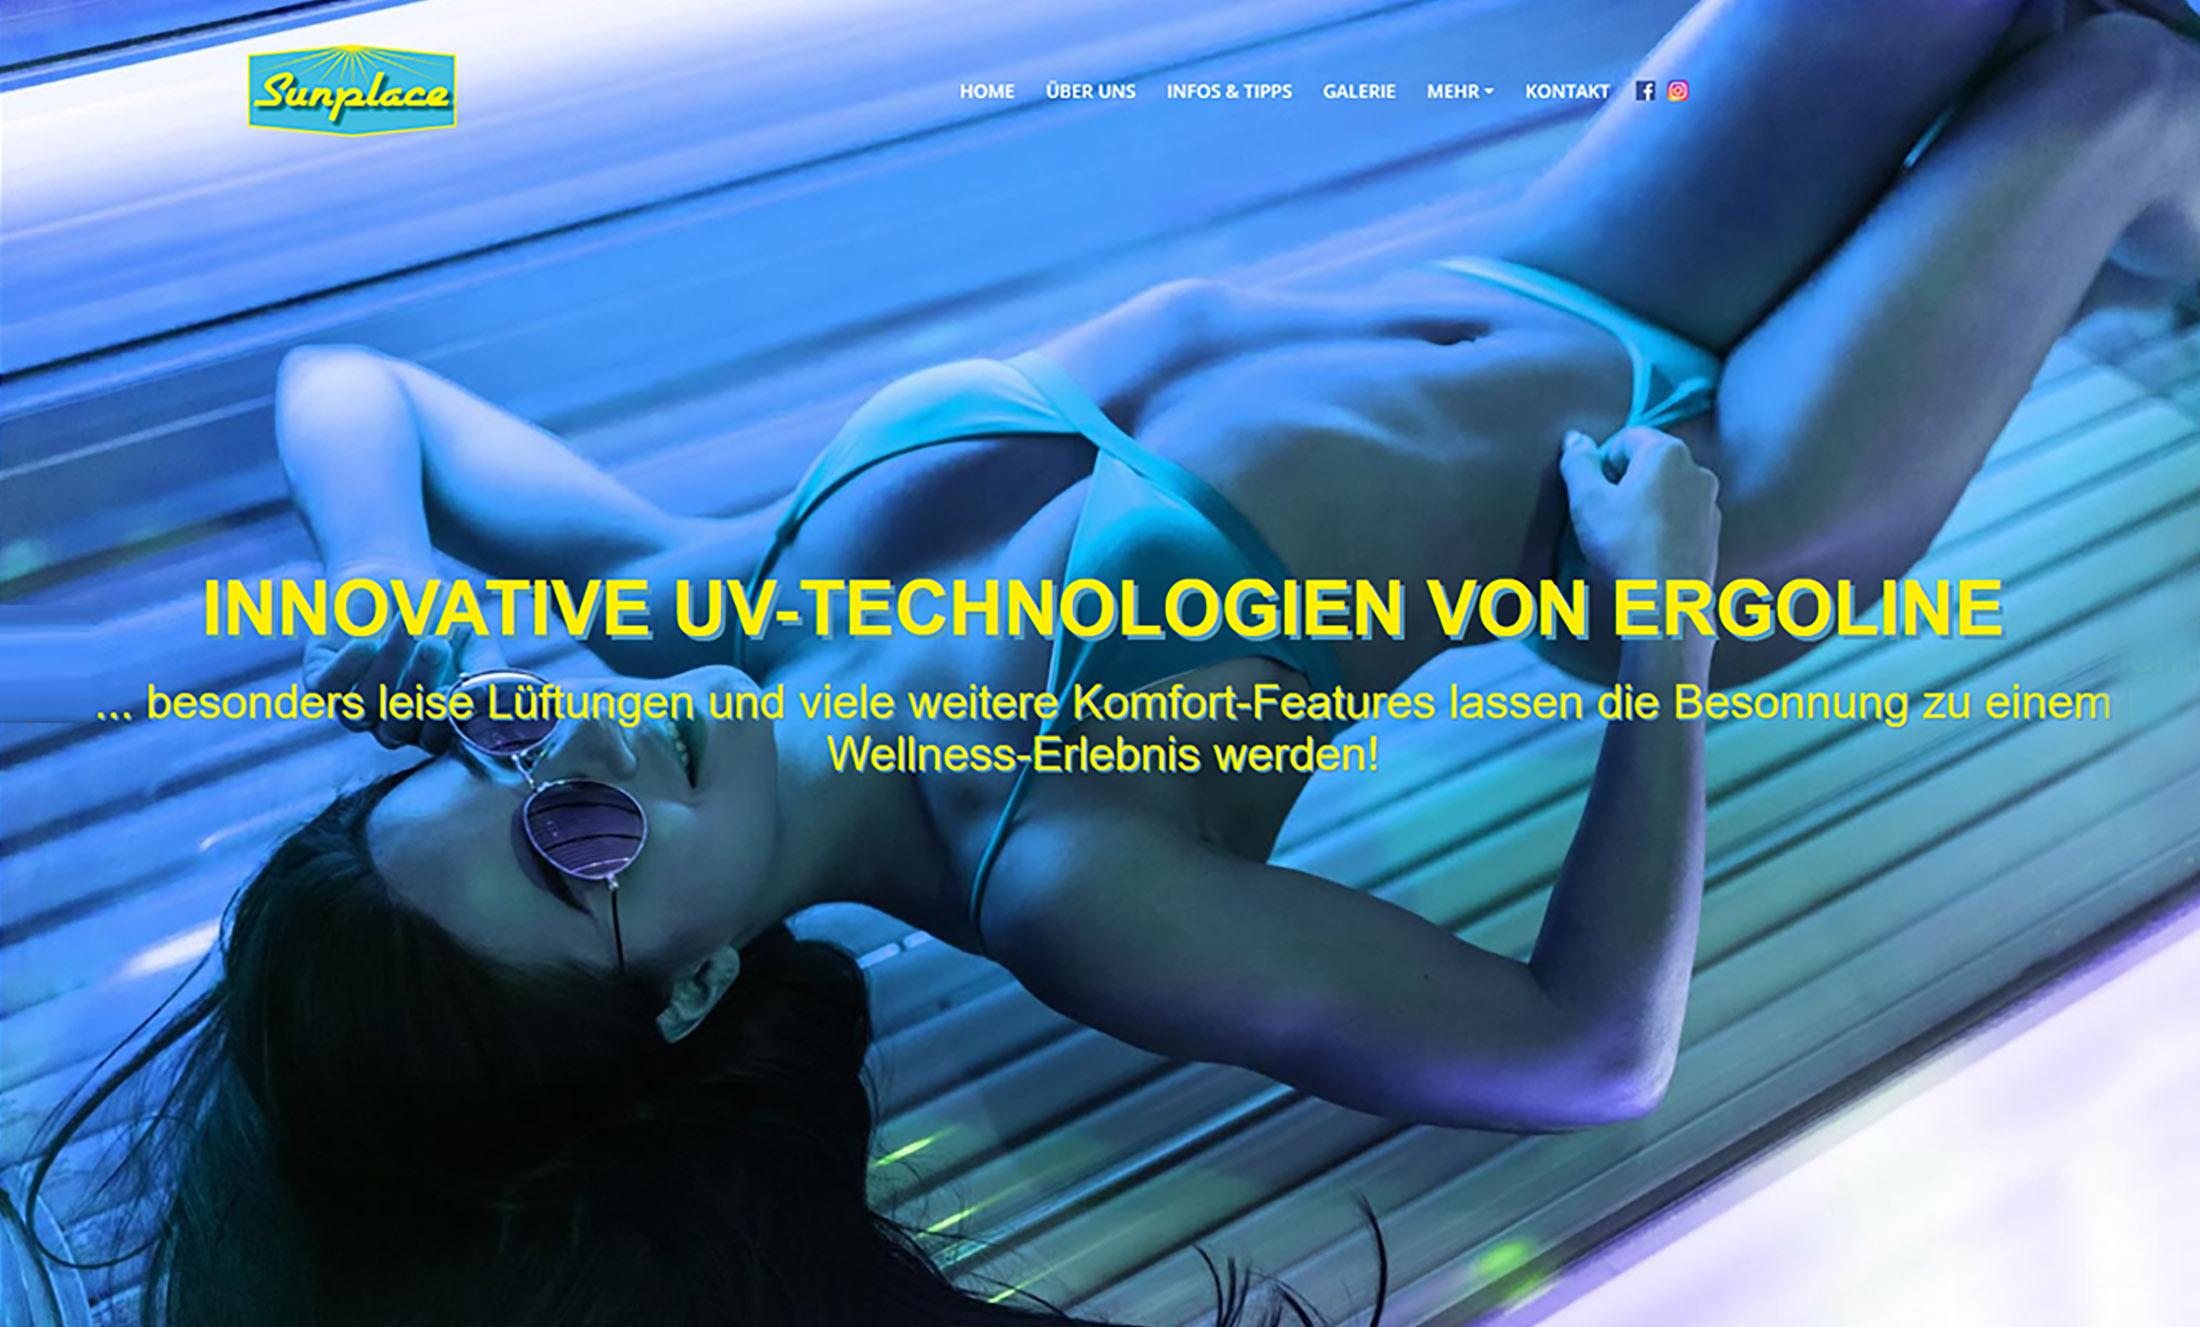 Projekt sunplace slider-werbeagentur -3 design-meets-web-web-grafik-print-werbetechnik-muenchen-markt schwaben (2)